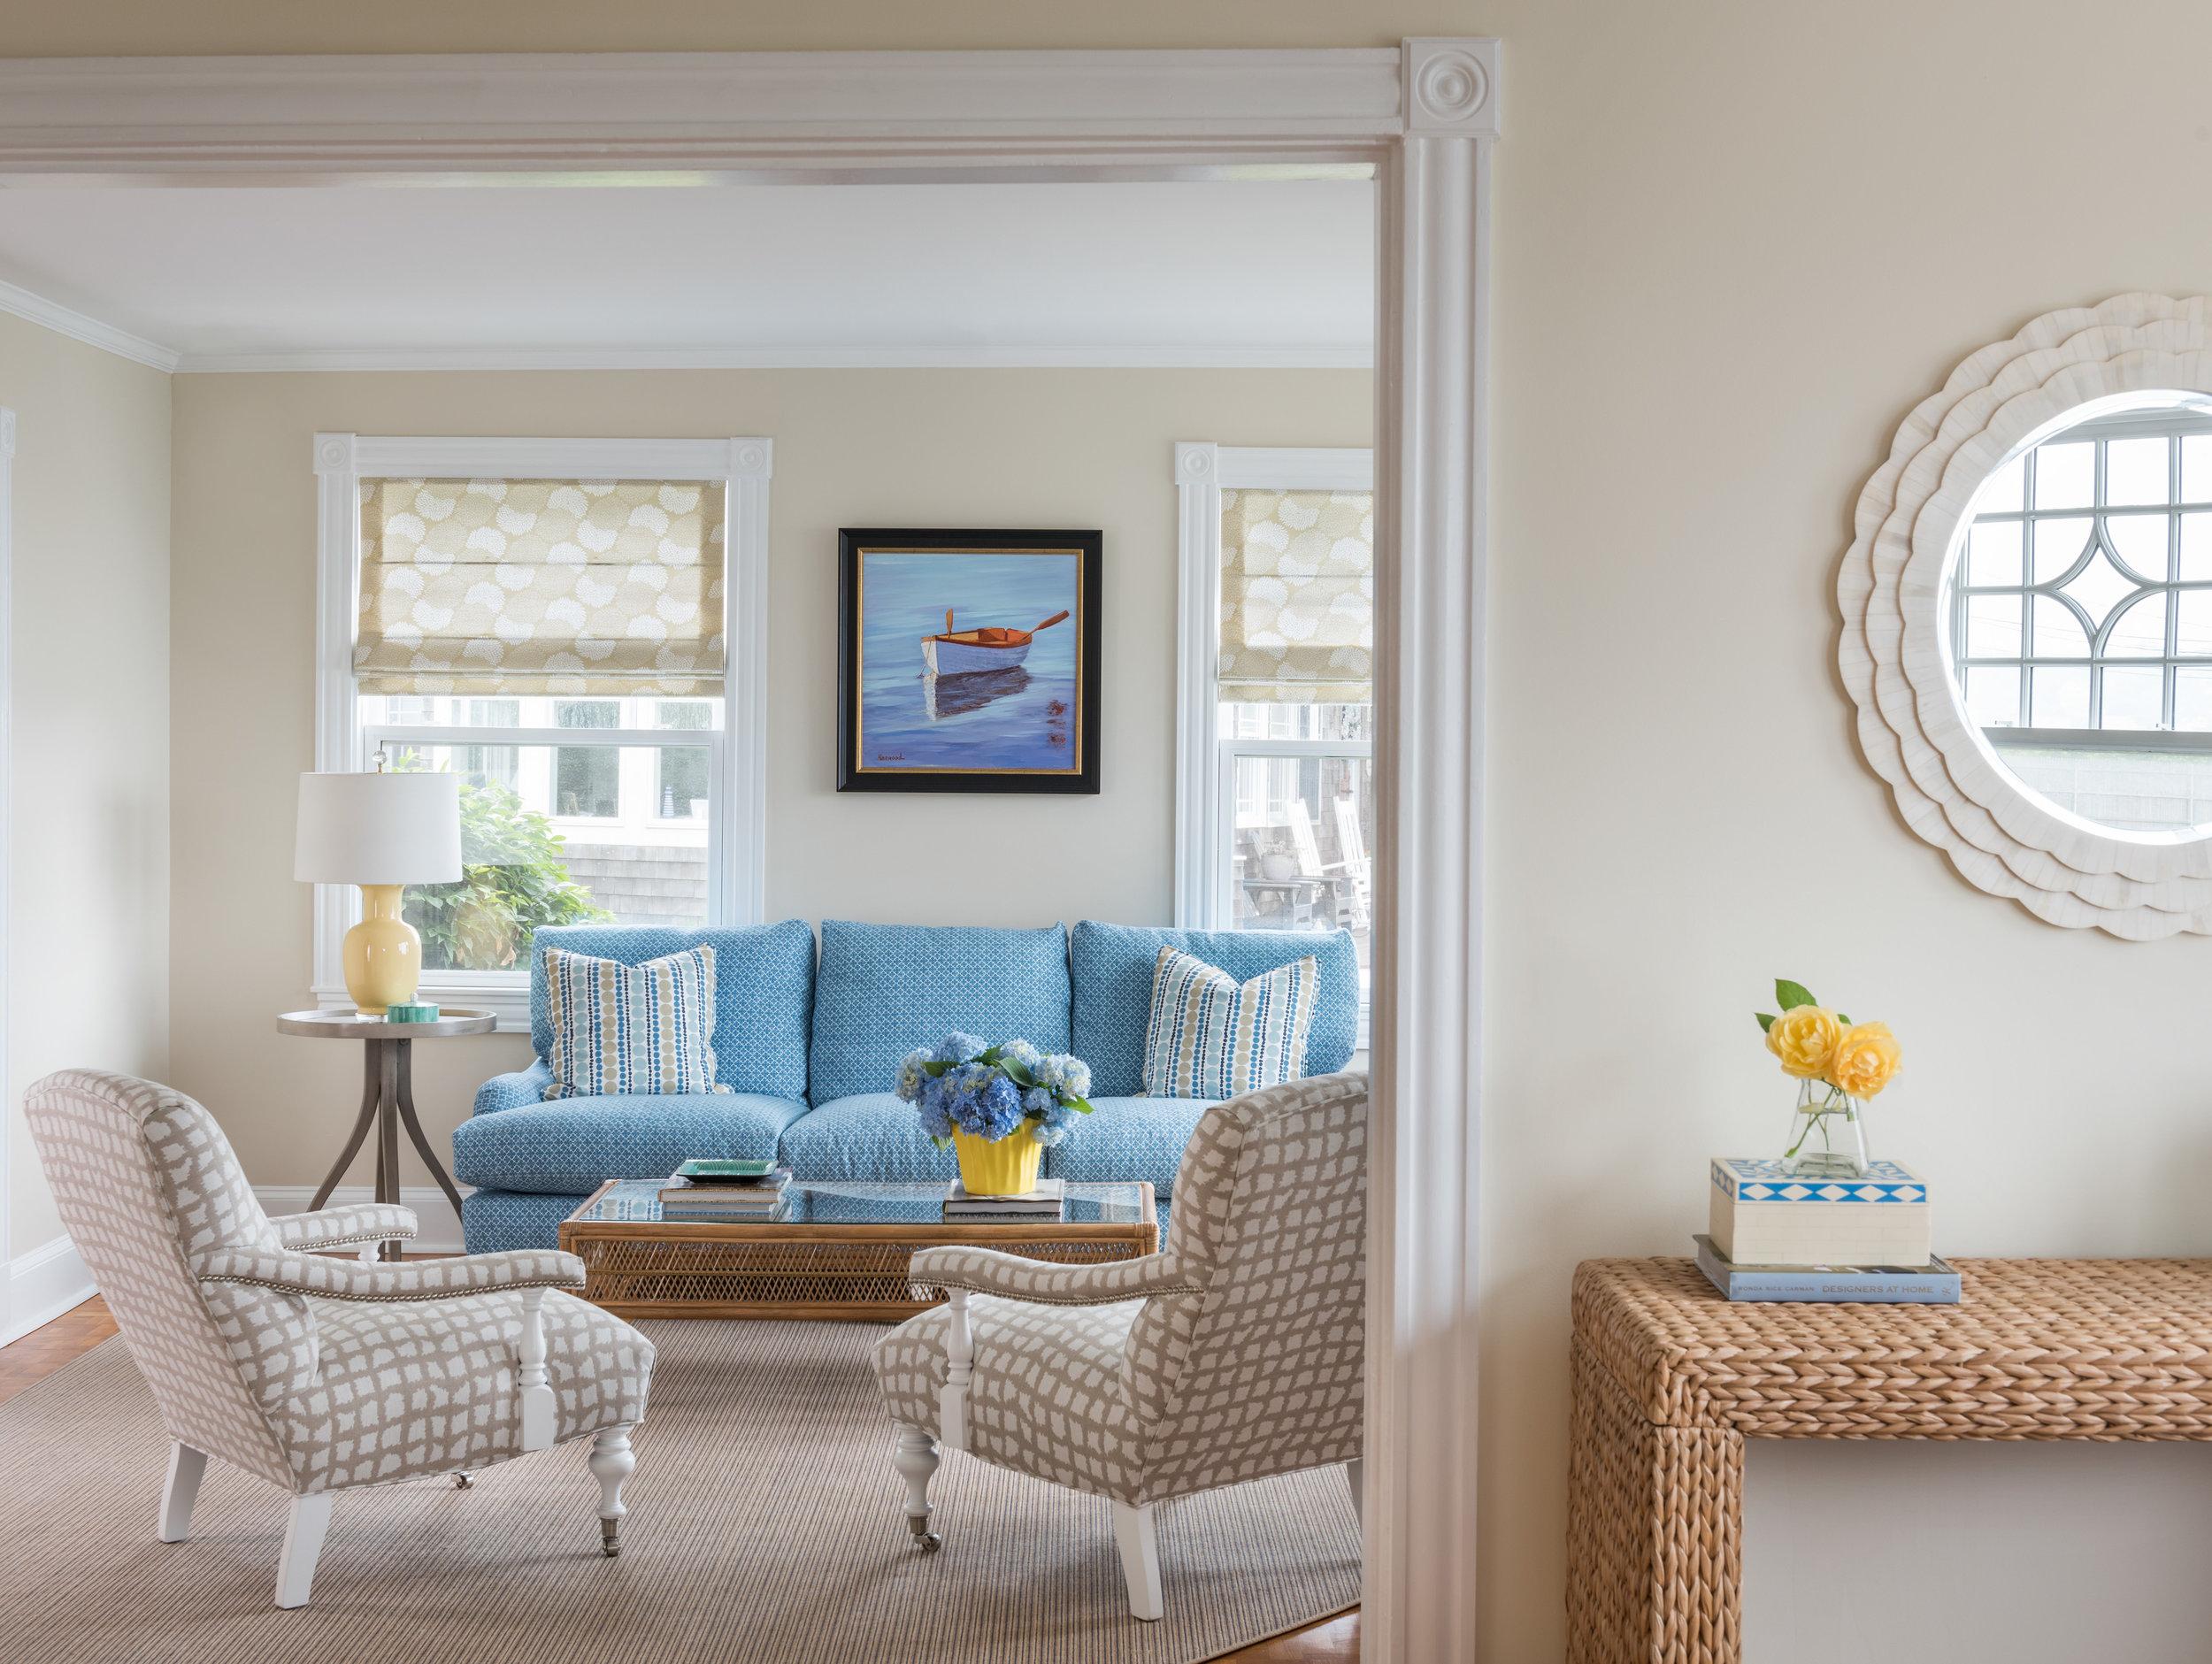 Easton's Beach, Newport, Rhode Island, Interior Design, Living Room Design, Entryway Design, Interior Designer,